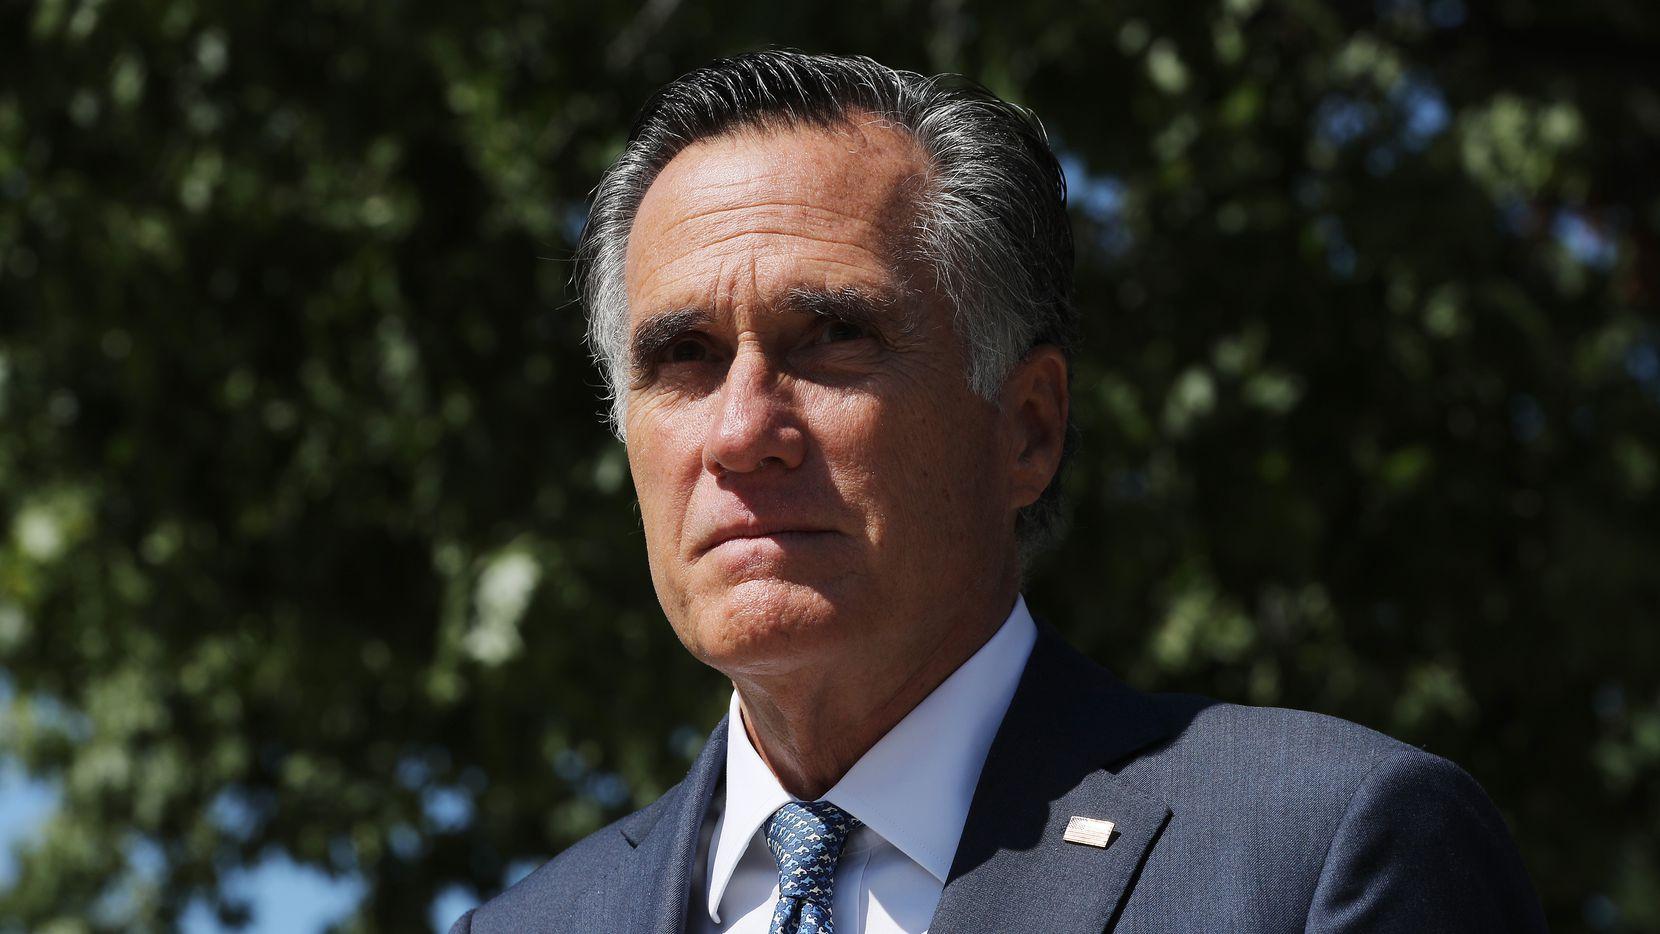 Sen. Mitt Romney, R-Utah, leaves a meeting of GOP senators at the National Republican Senatorial Committee offices Sept. 22, 2020 in Washington.